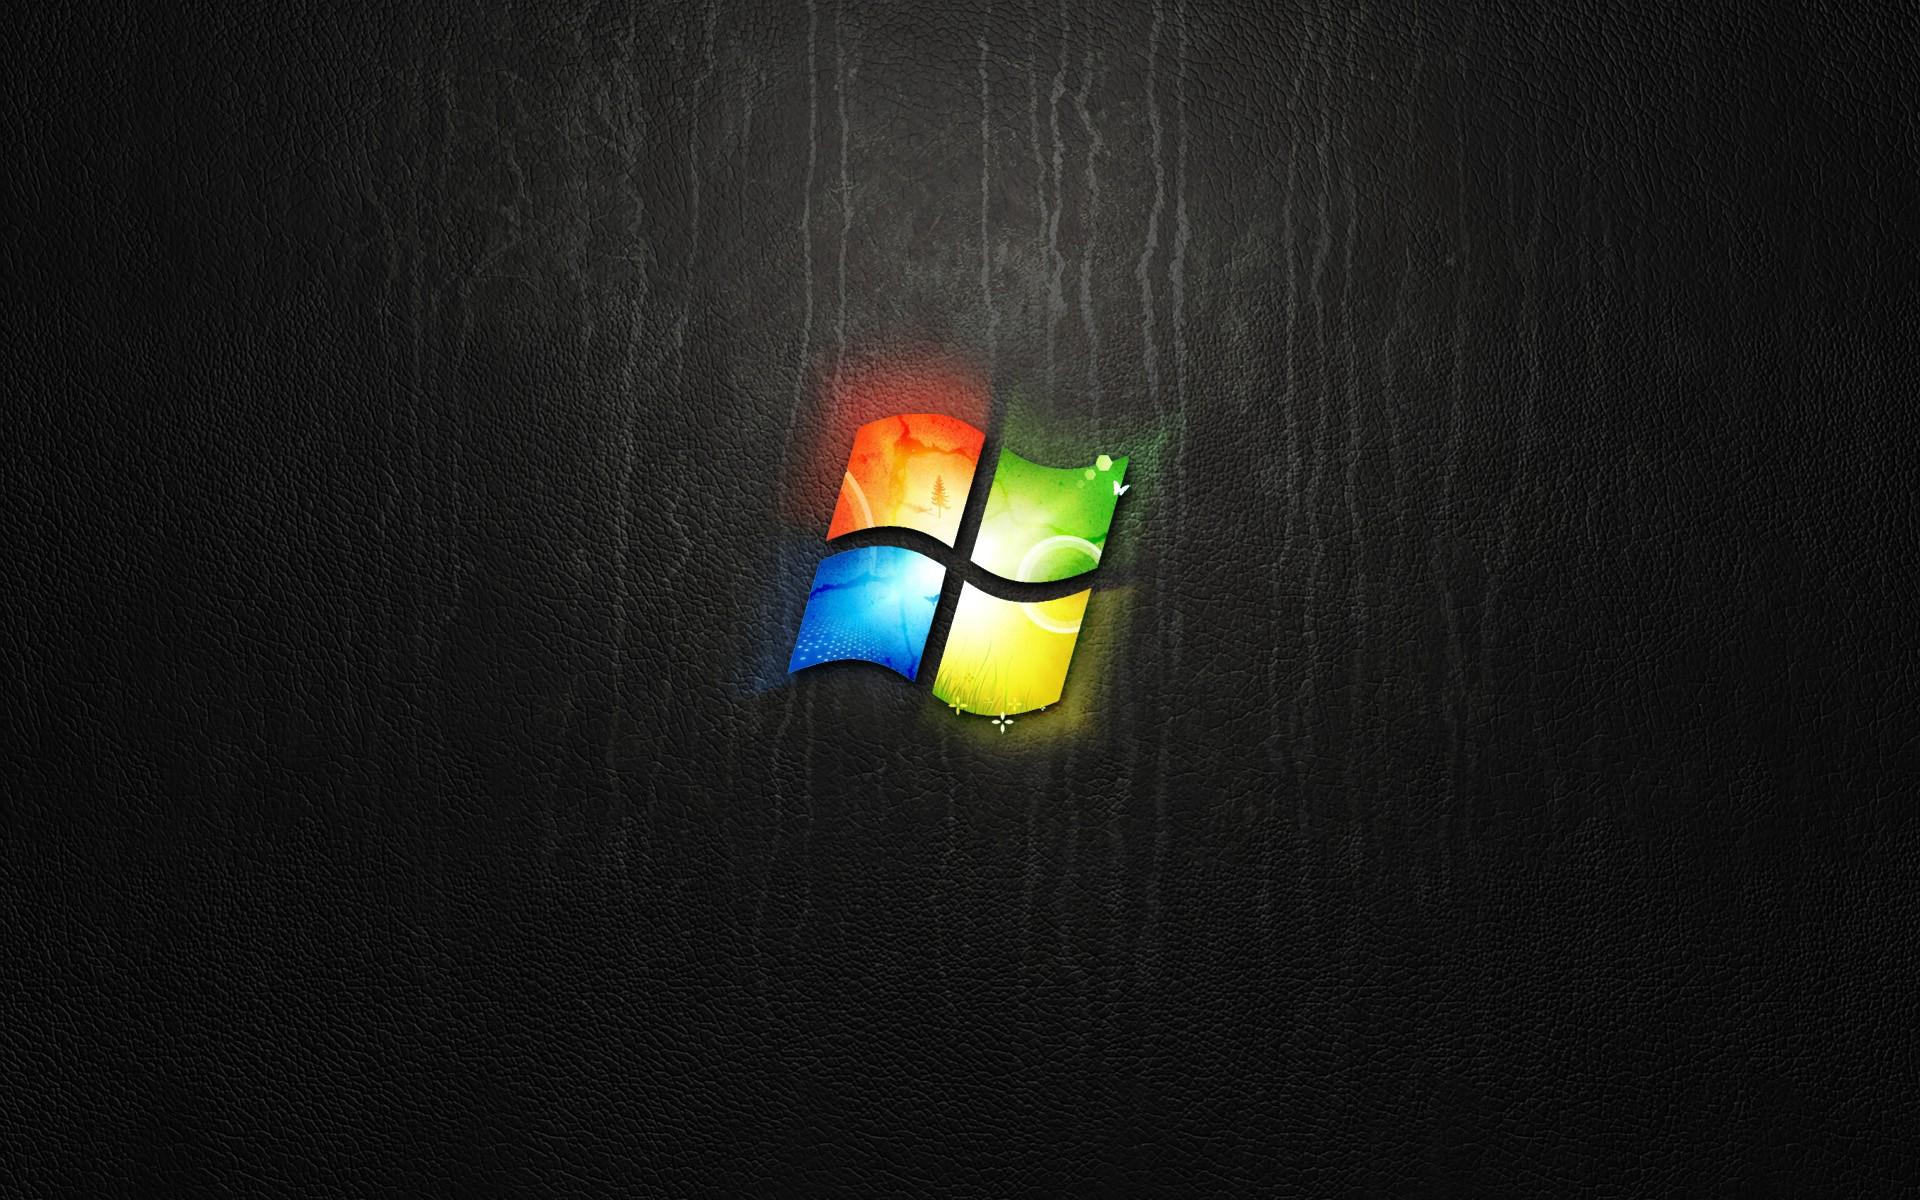 Windows 8 Wallpaper 1680X1050 wallpaper   796590 1920x1200